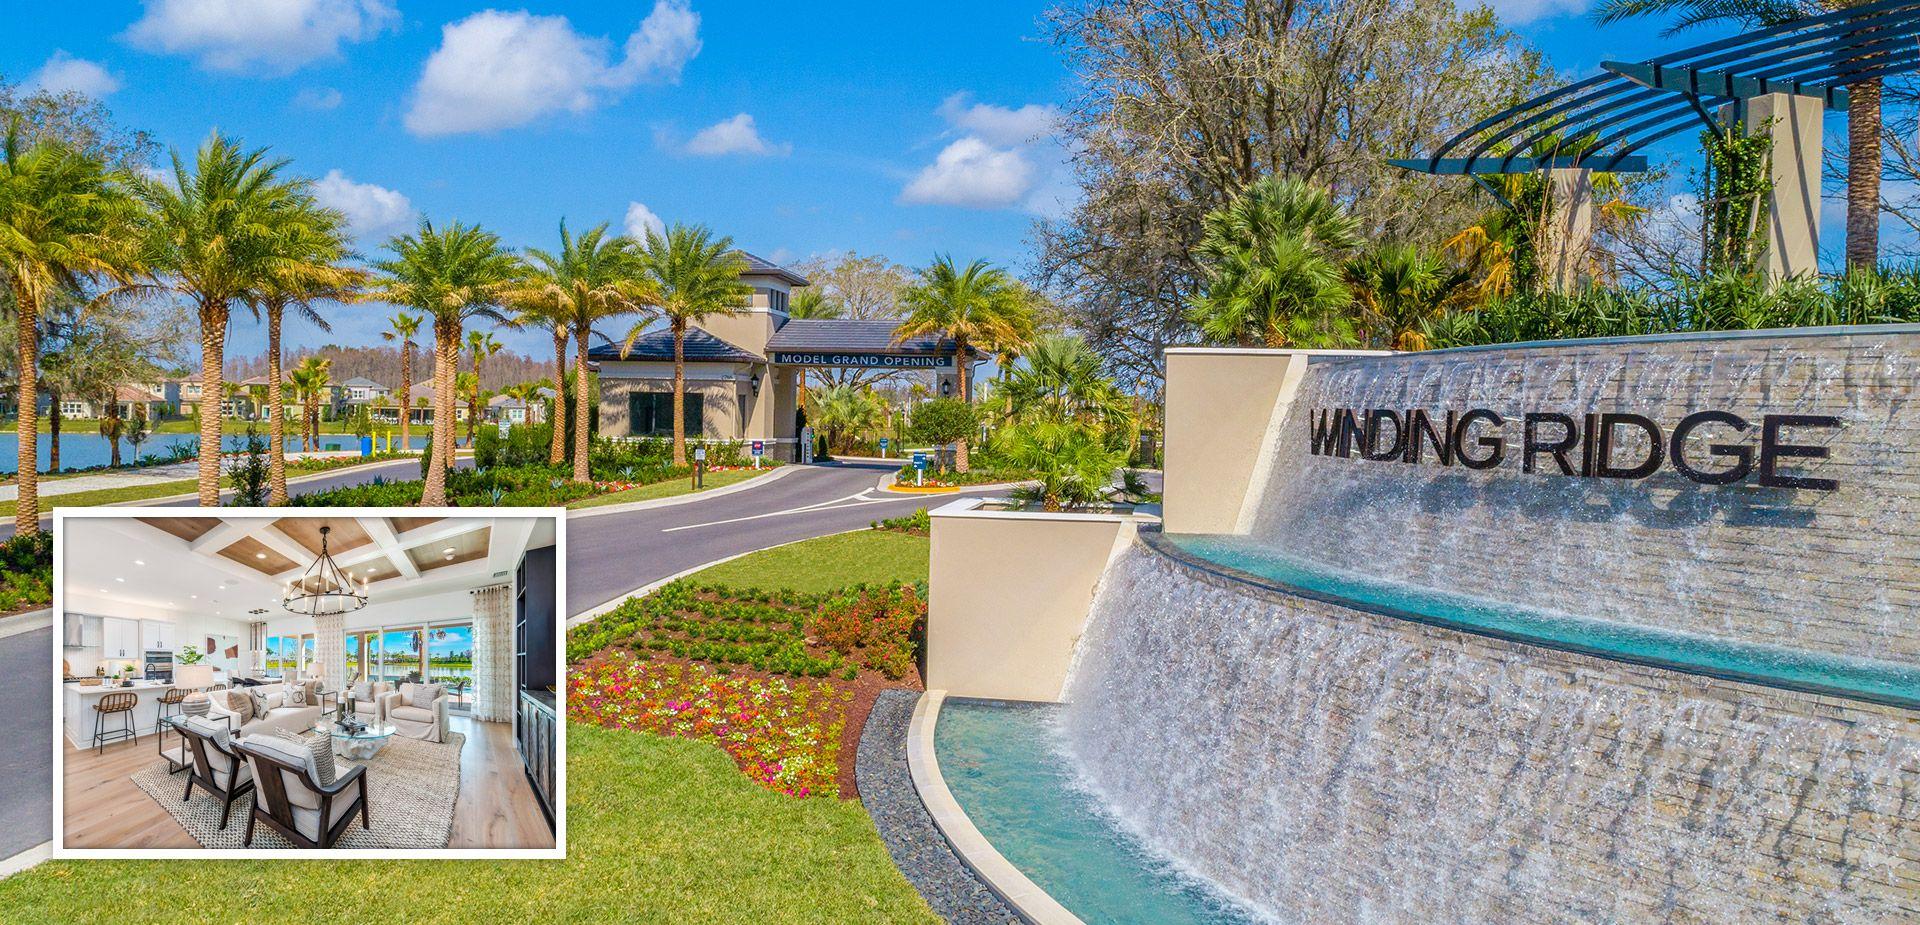 'Winding Ridge' by G.L. Homes in Tampa-St. Petersburg